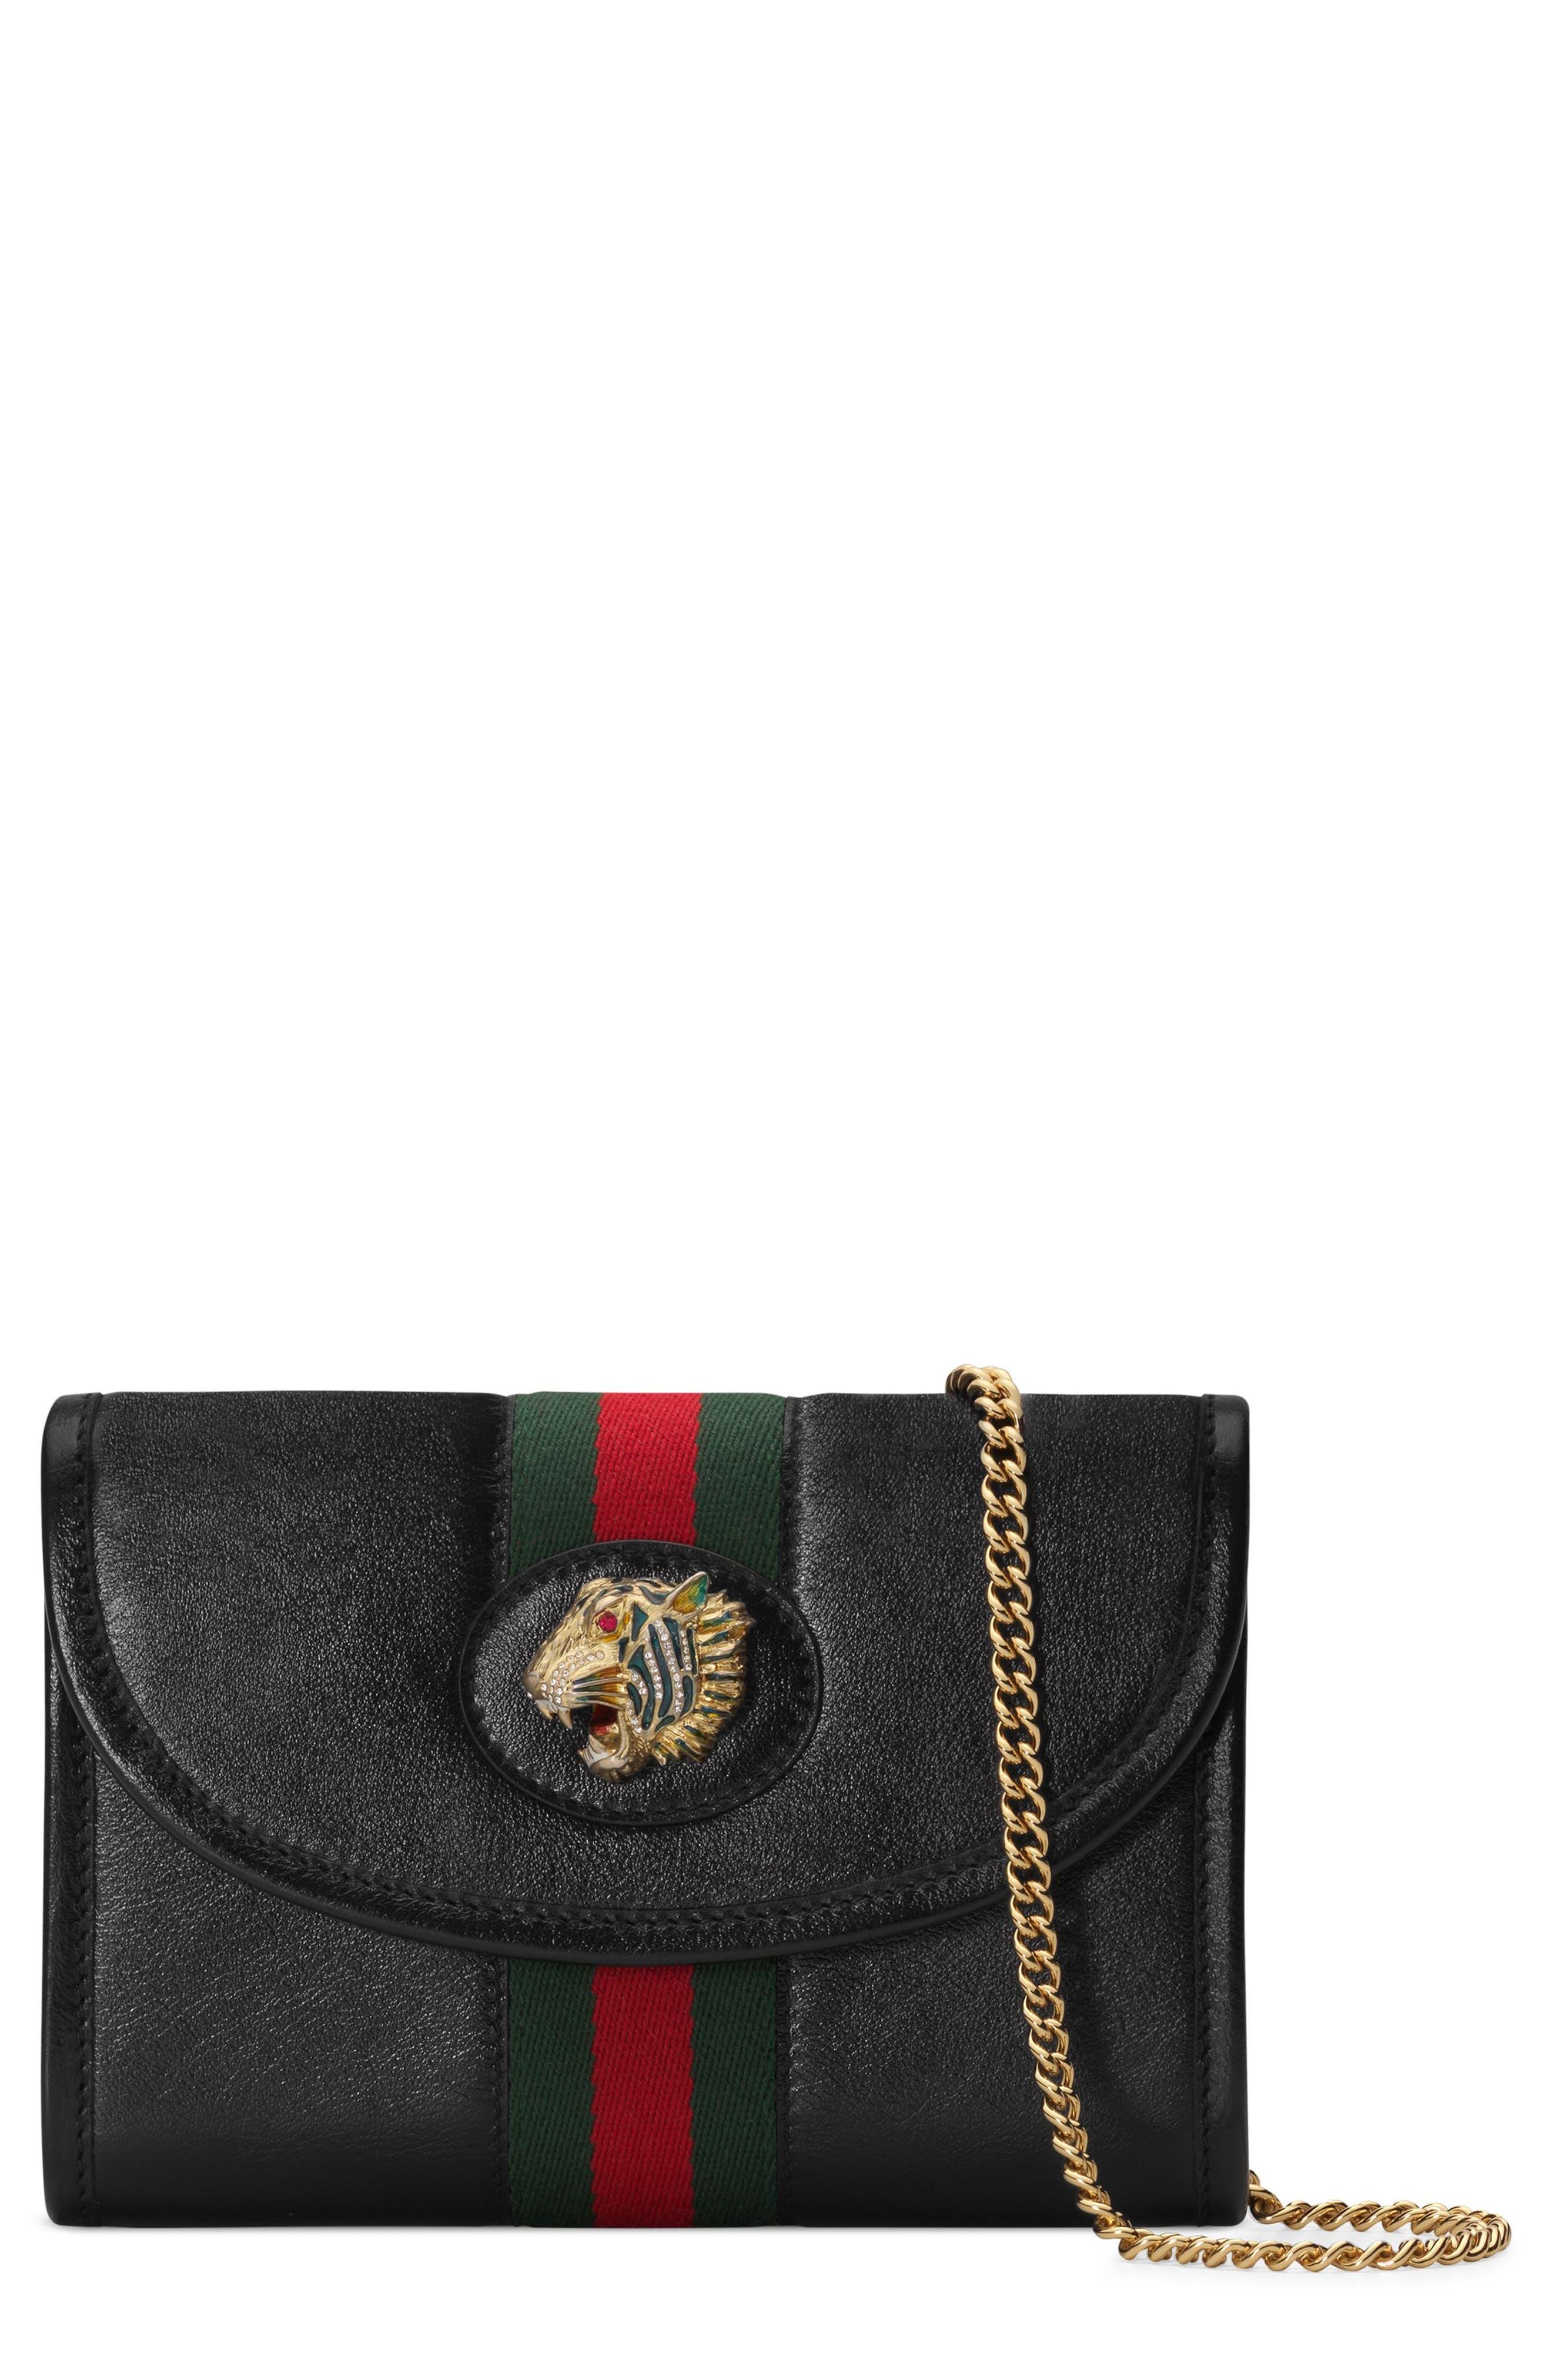 ,                             Mini Rajah Leather Crossbody Bag,                             Main thumbnail 1, color,                             NERO/ VERT RED MULTI